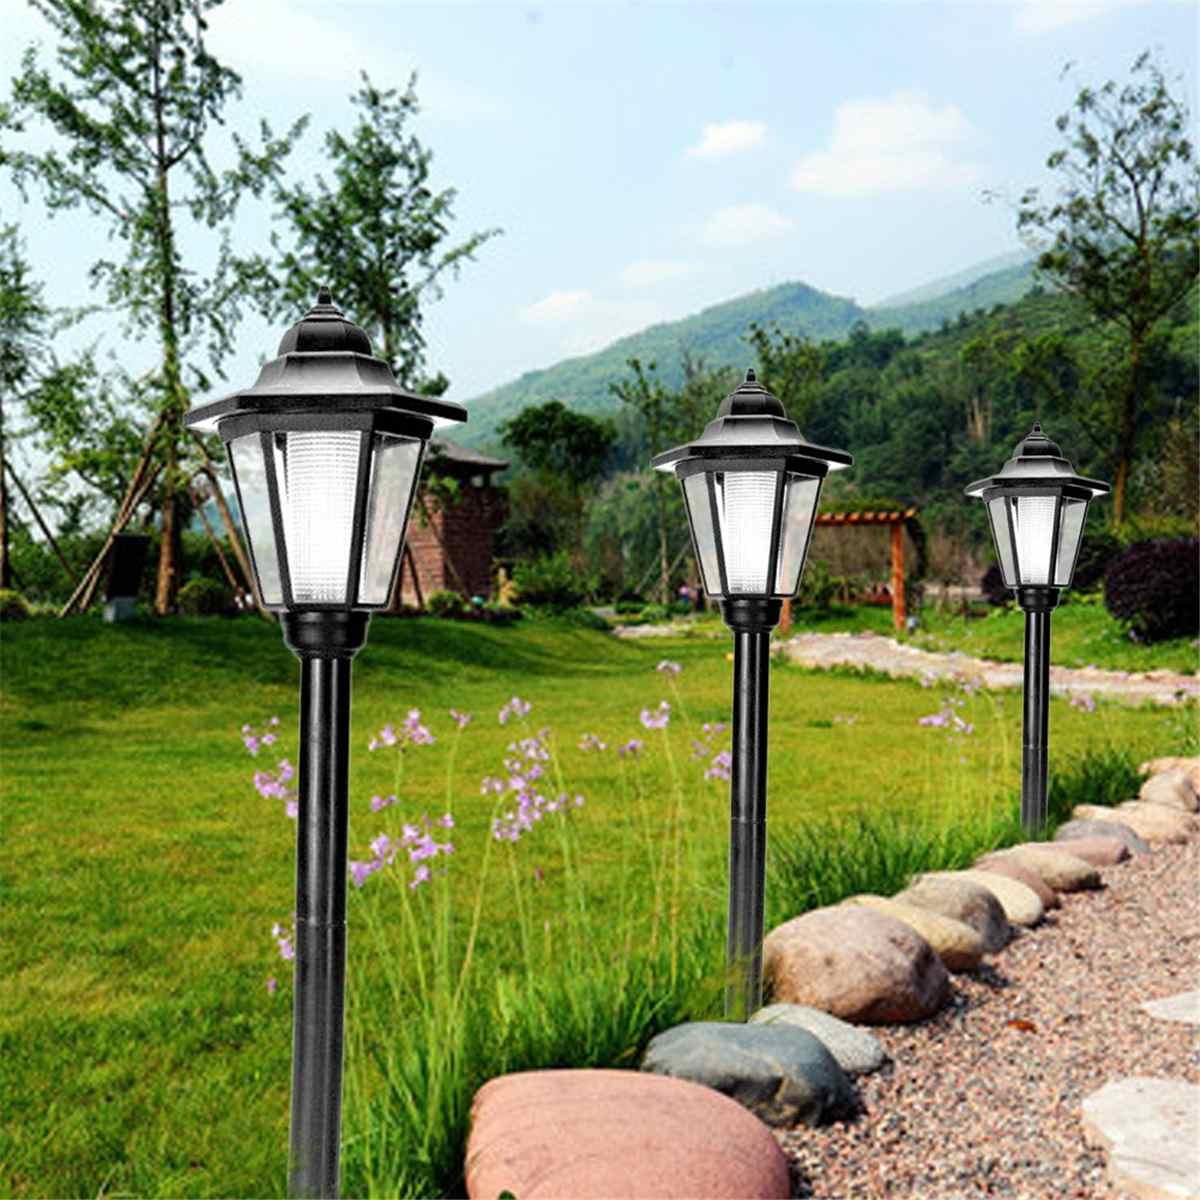 Lawn Lamp Post Outdoor Garden Lanterns Pillar Yard Garden Decoration Lighting White Light LED Solar Light Under Ground